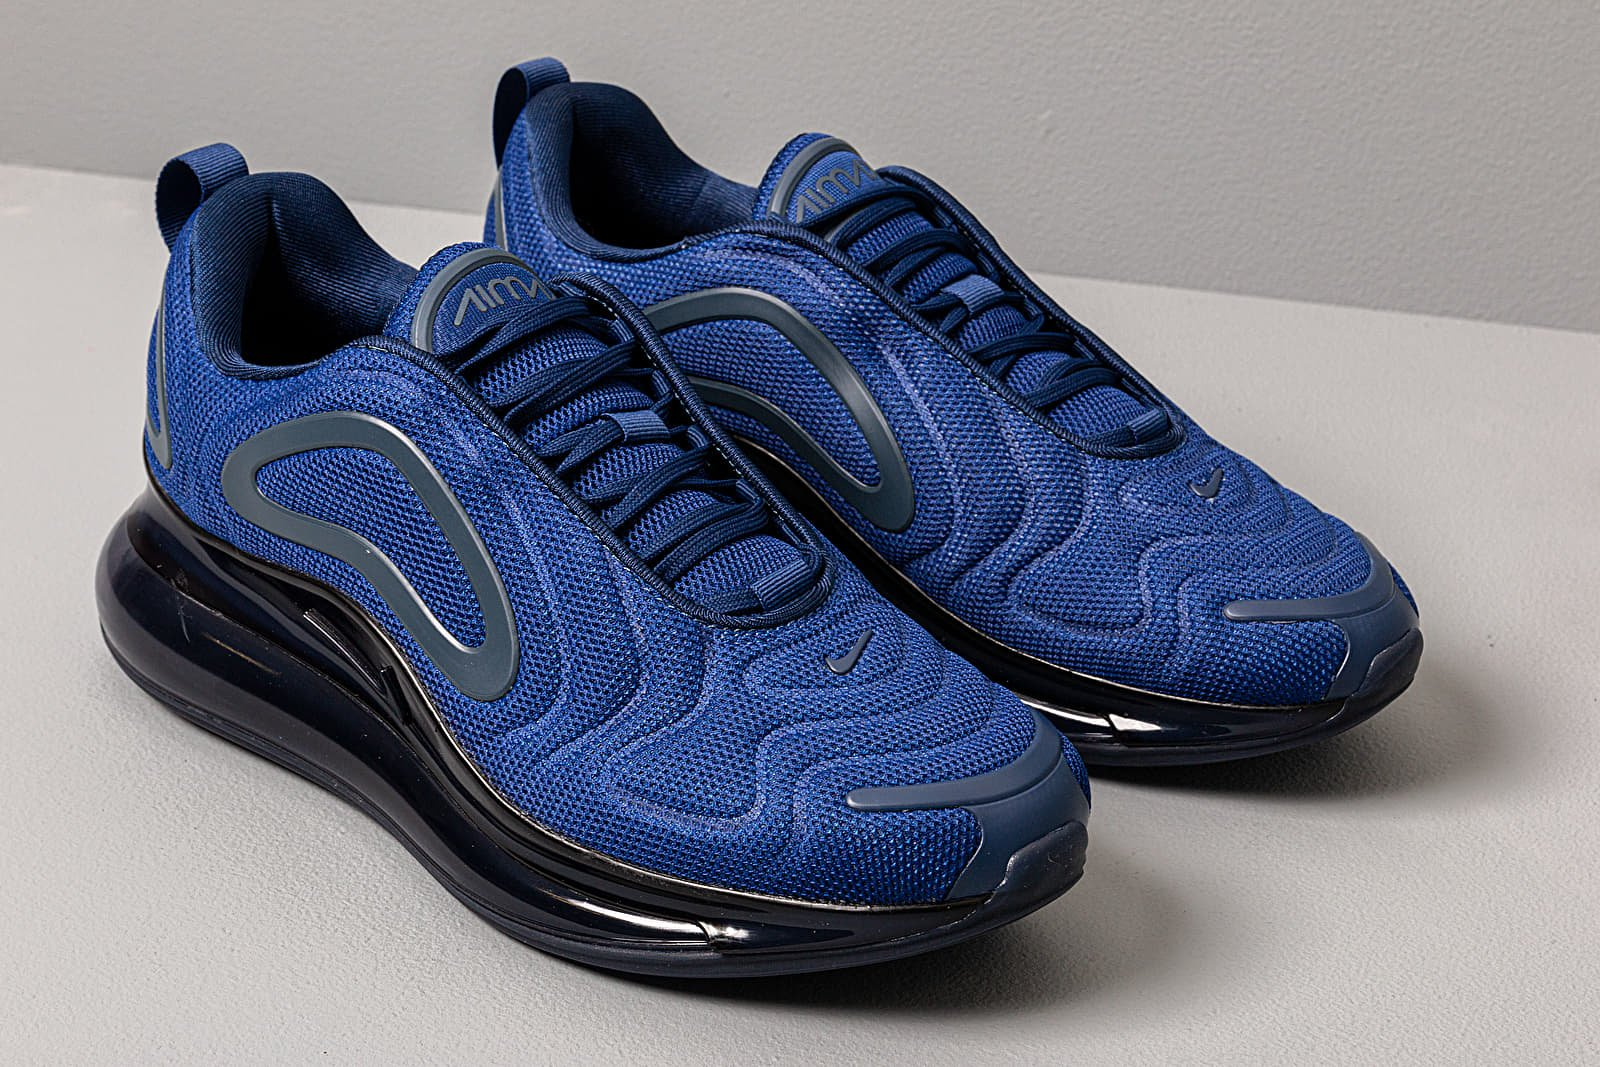 air max 720 blu e nere